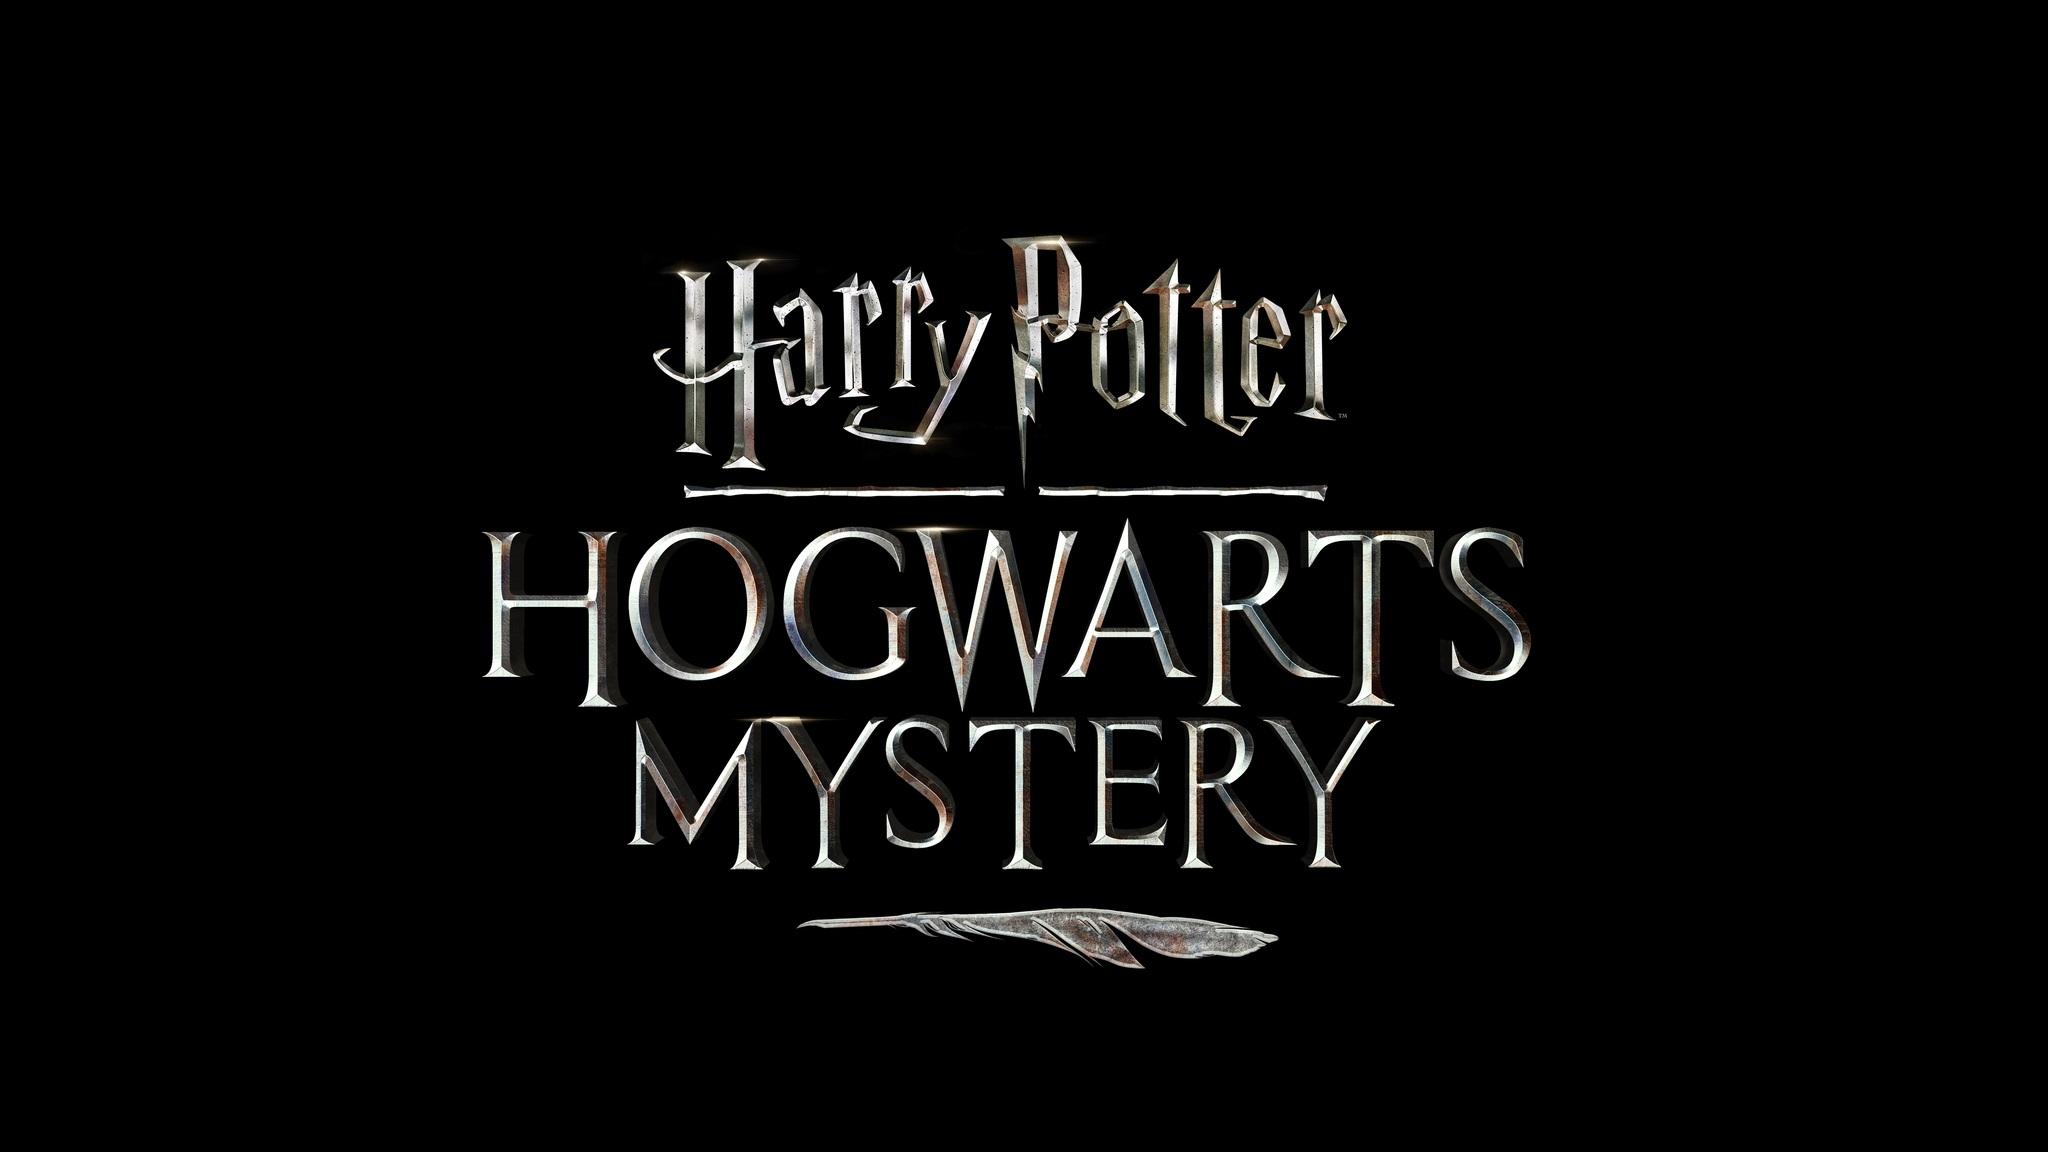 Most Inspiring Wallpaper Harry Potter Black And White - harry-potter-hogwarts-mystery-game-logo-gc-2048x1152  Snapshot_334012.jpg